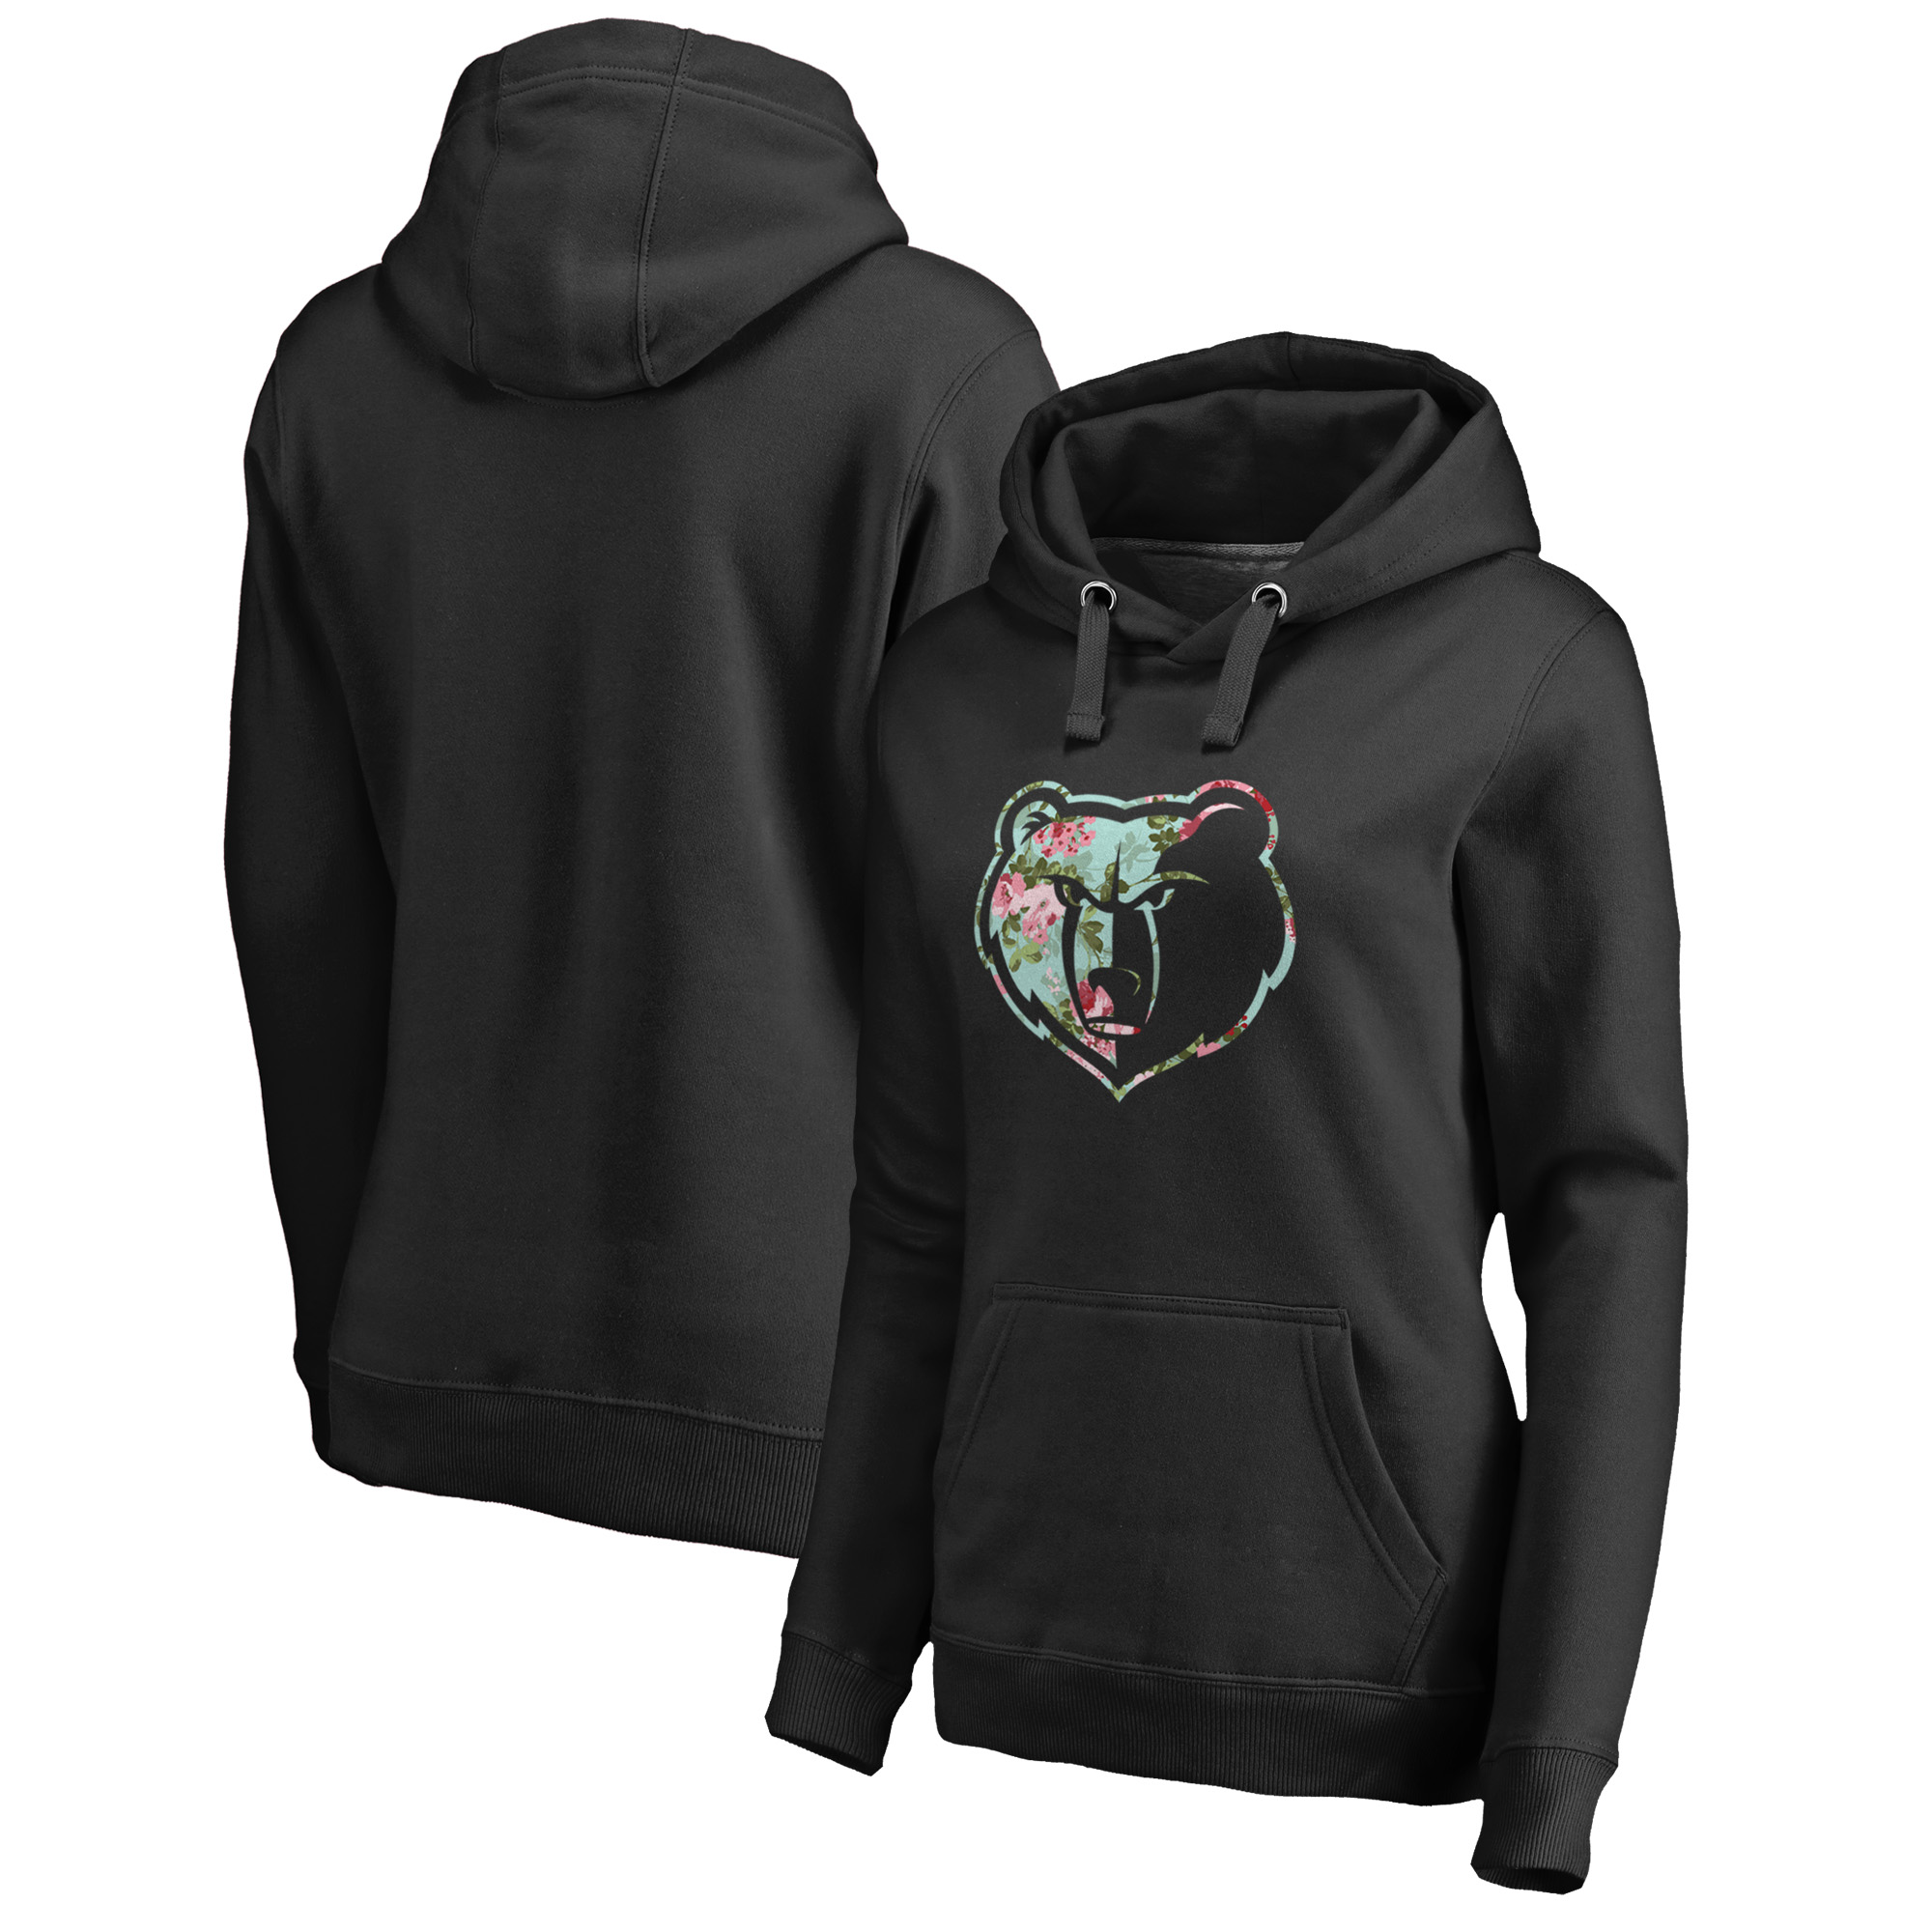 Memphis Grizzlies Fanatics Branded Women's Lovely Plus Size Pullover Hoodie - Black